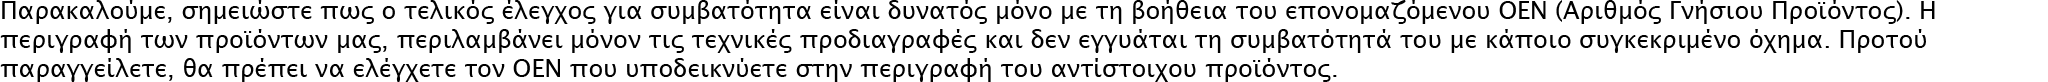 ALLIGATOR Αισθητήρας τροχού, σύστημα ελέγχου πίεσης ελαστικών